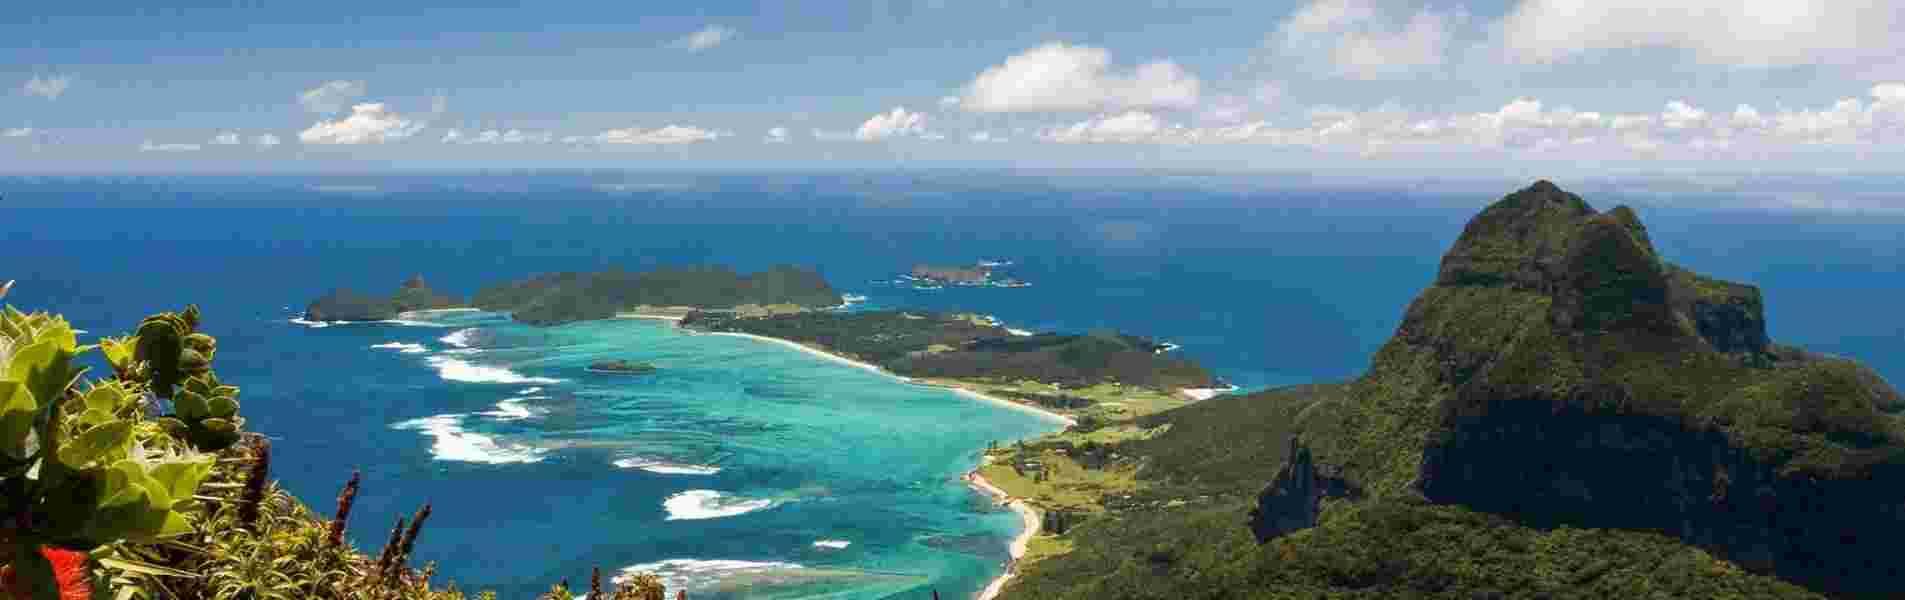 TOP 10 Overseas Getaways Without Leaving Australia! header image